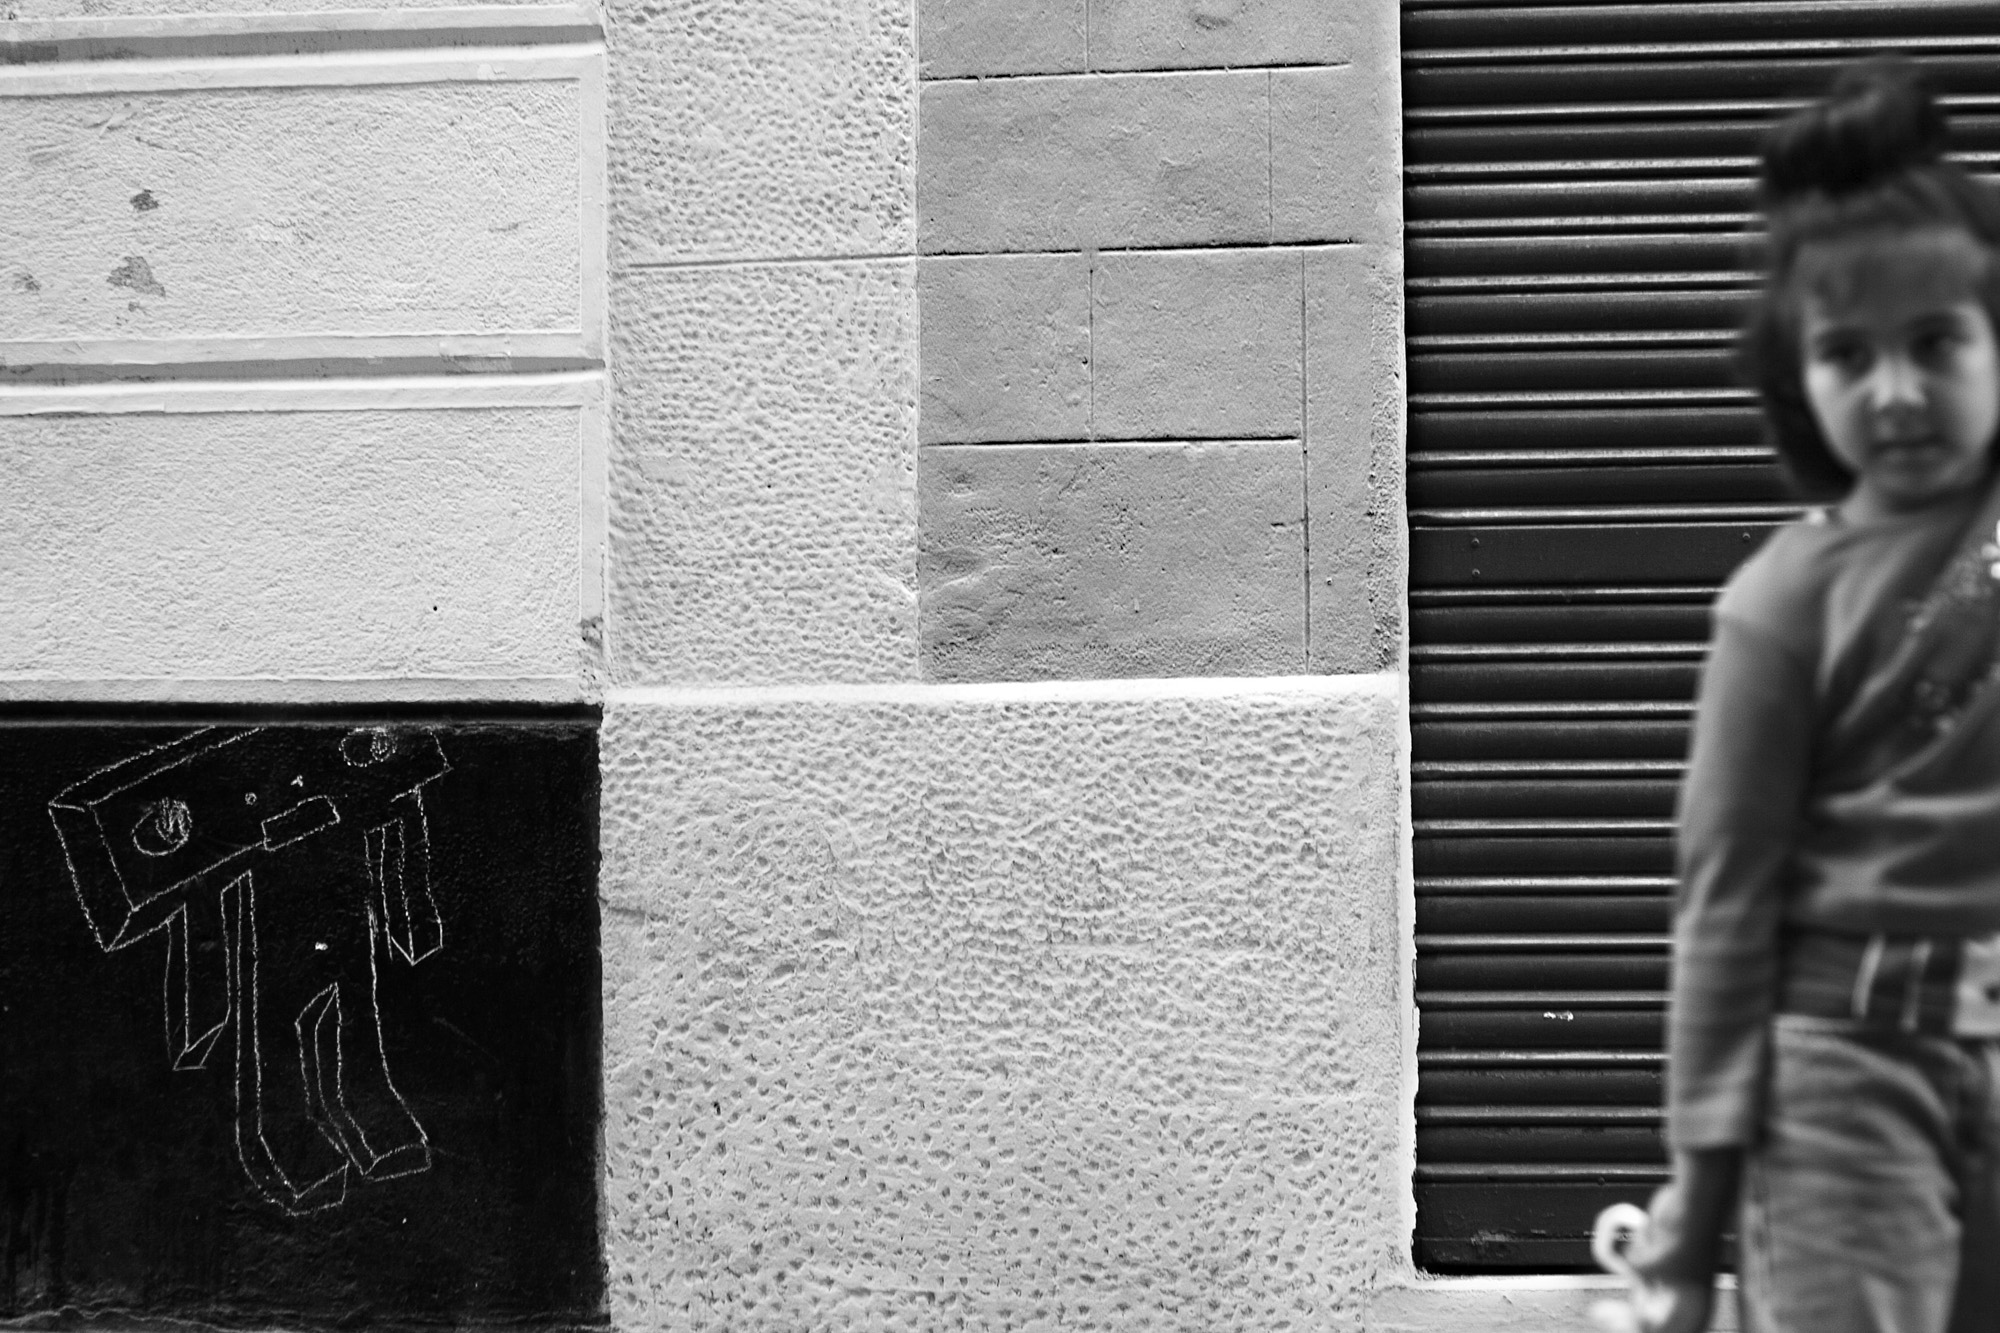 004testigos_anazaragoza.jpg